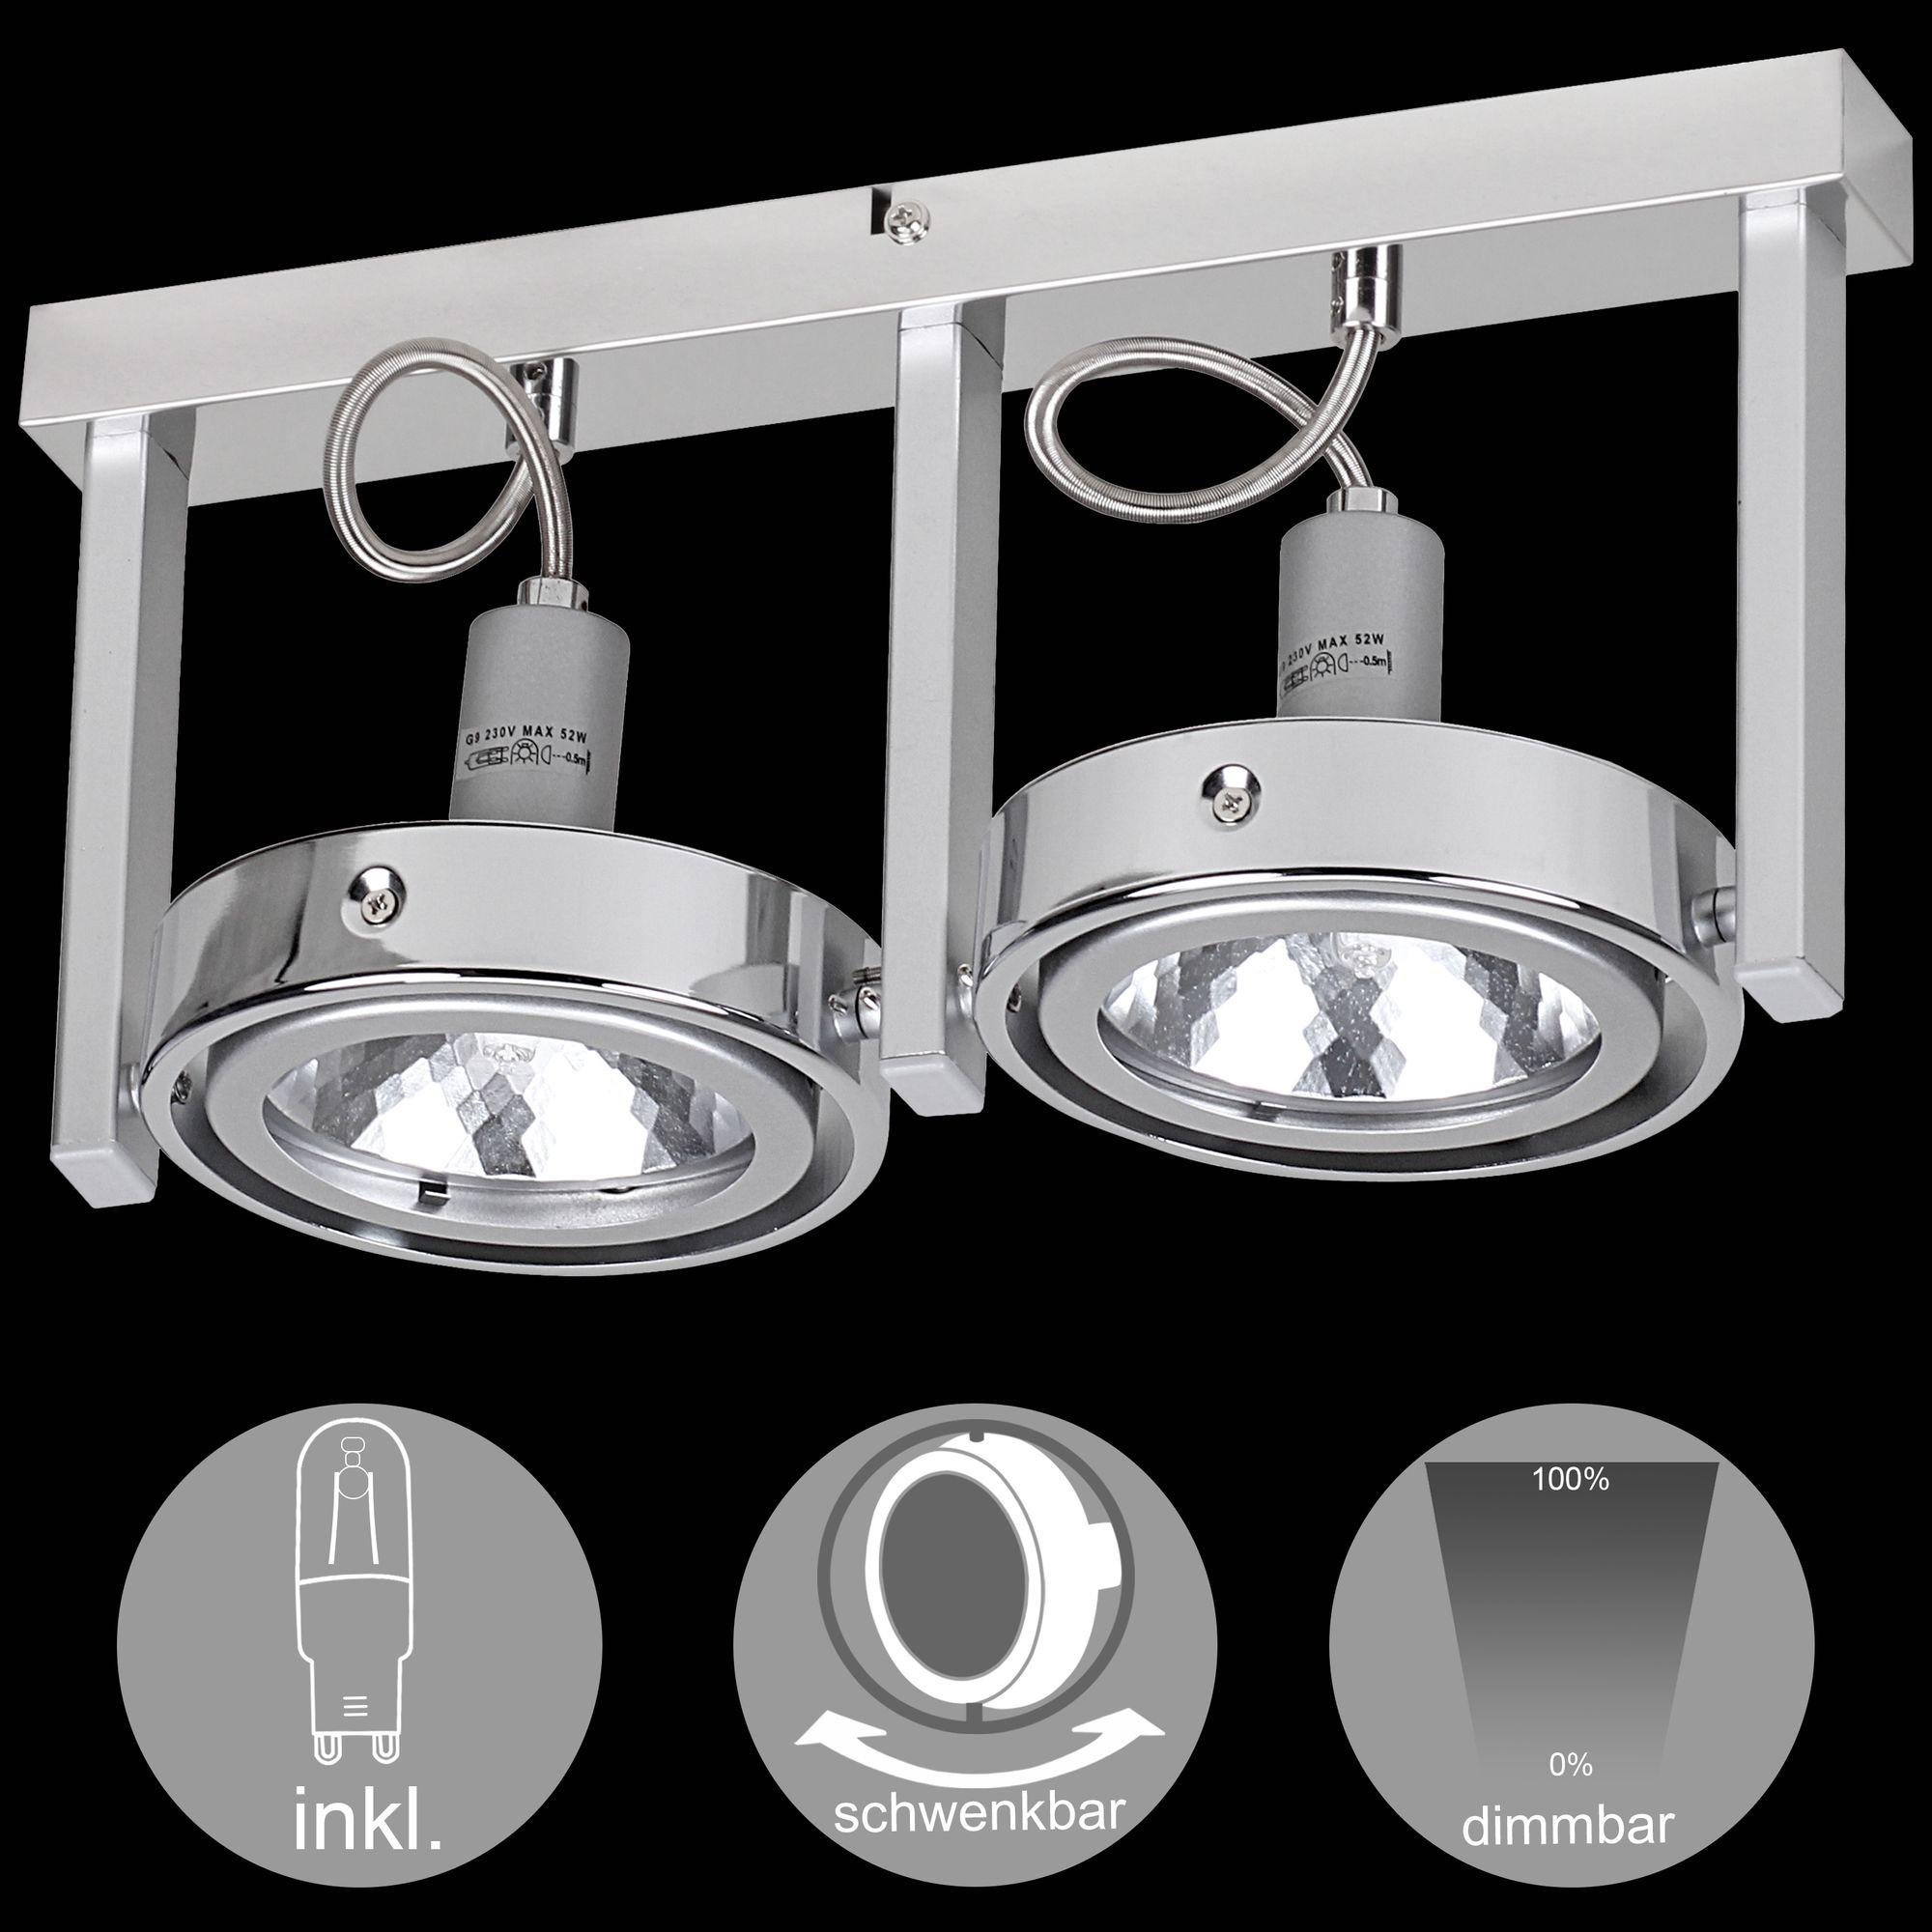 WOHNLING 1 flammig LED Deckenleuchte Lampe Strahler Spot Leuchte G9 EEK: A+